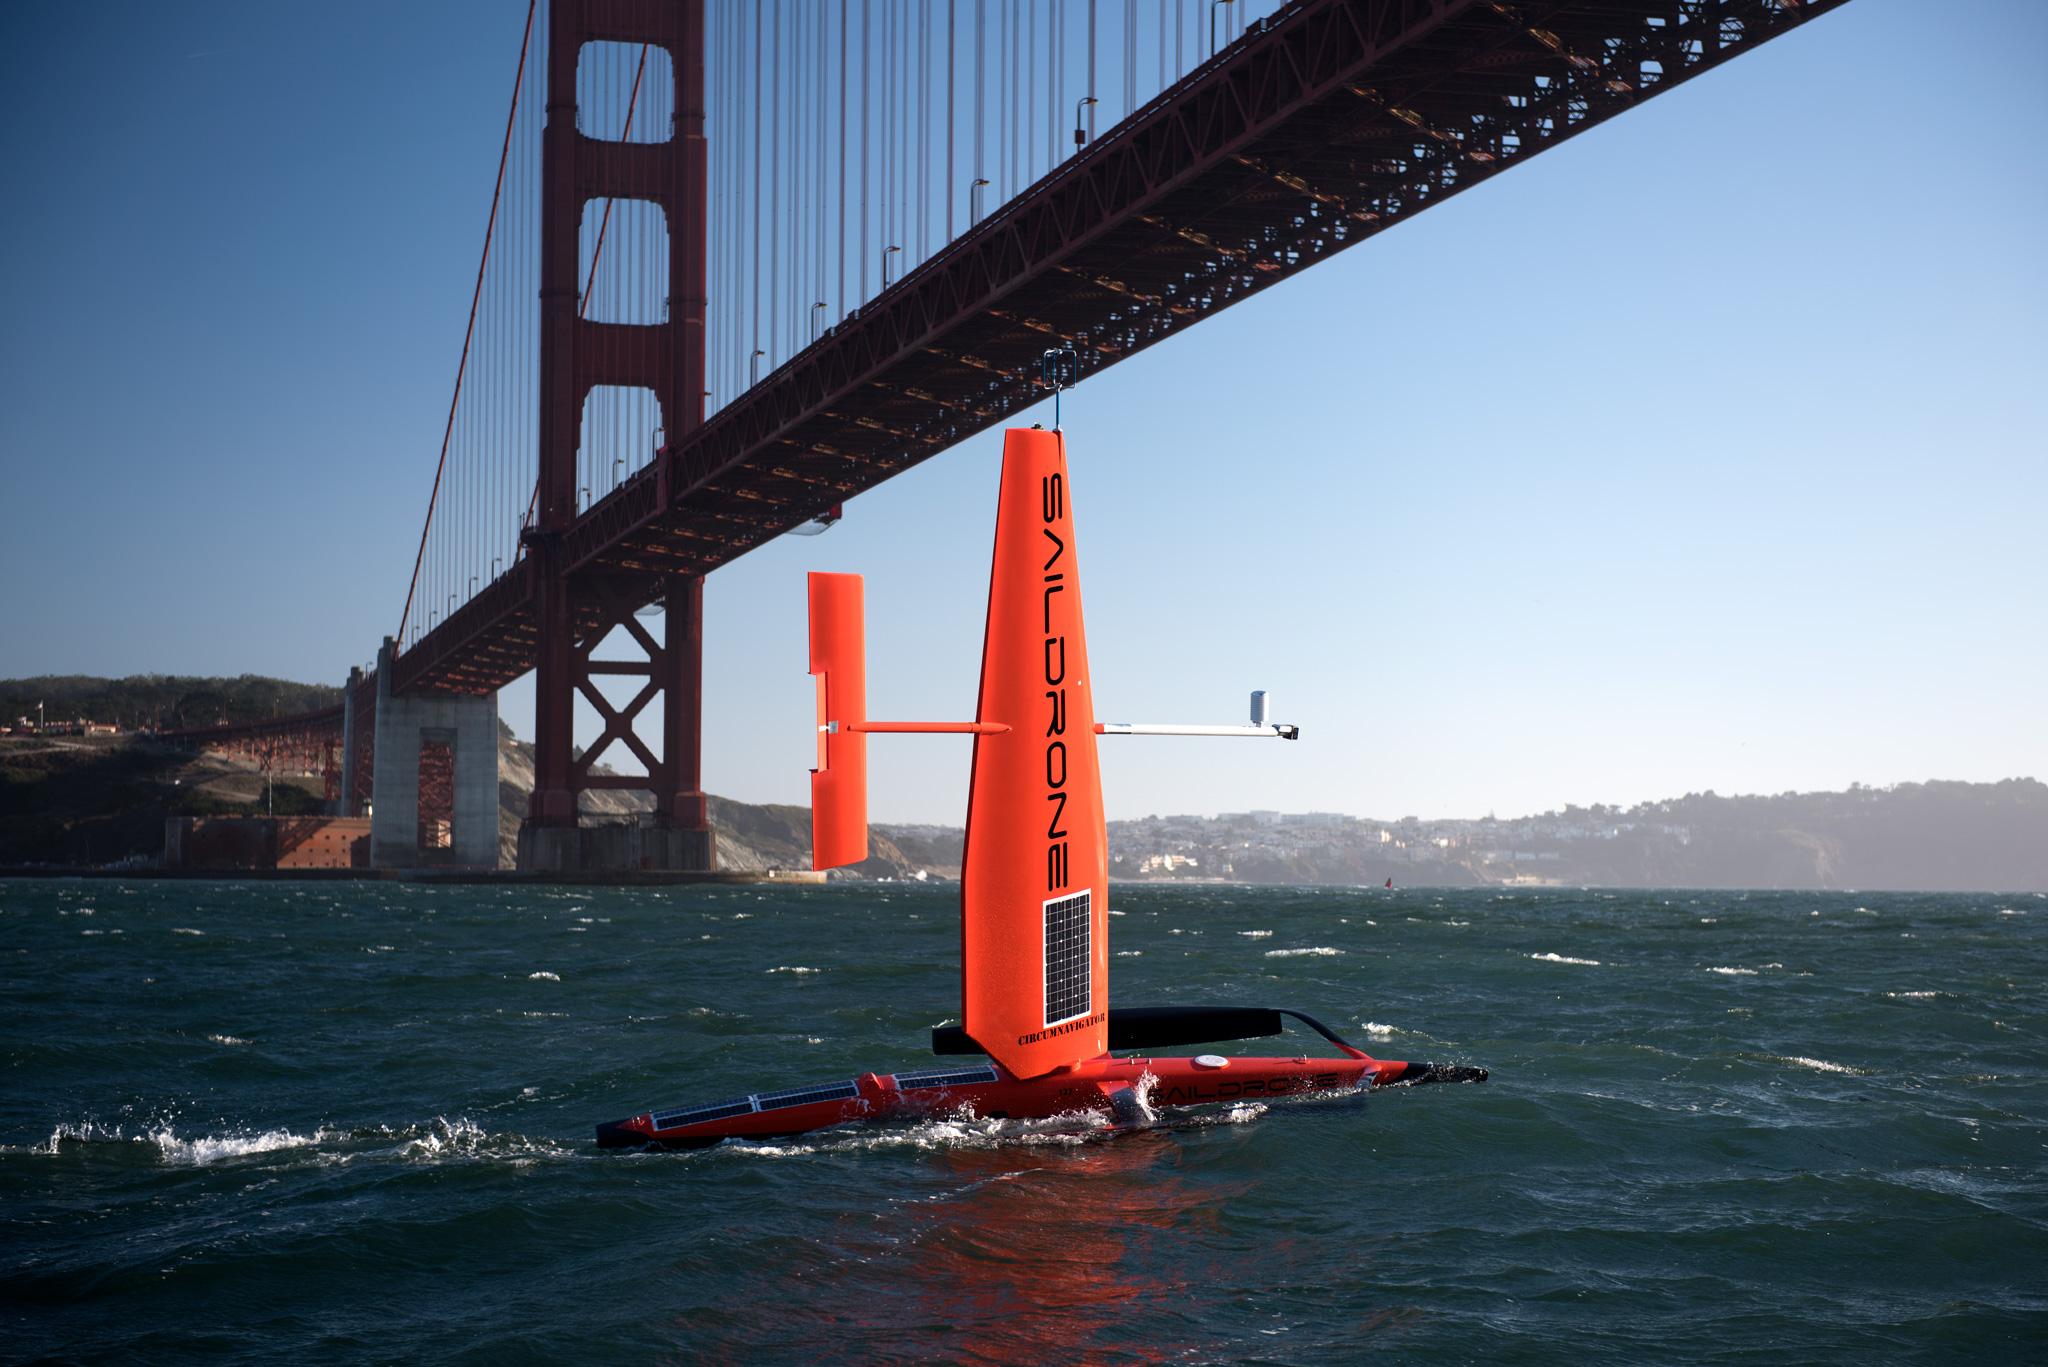 saildrone_01_bridge.jpg